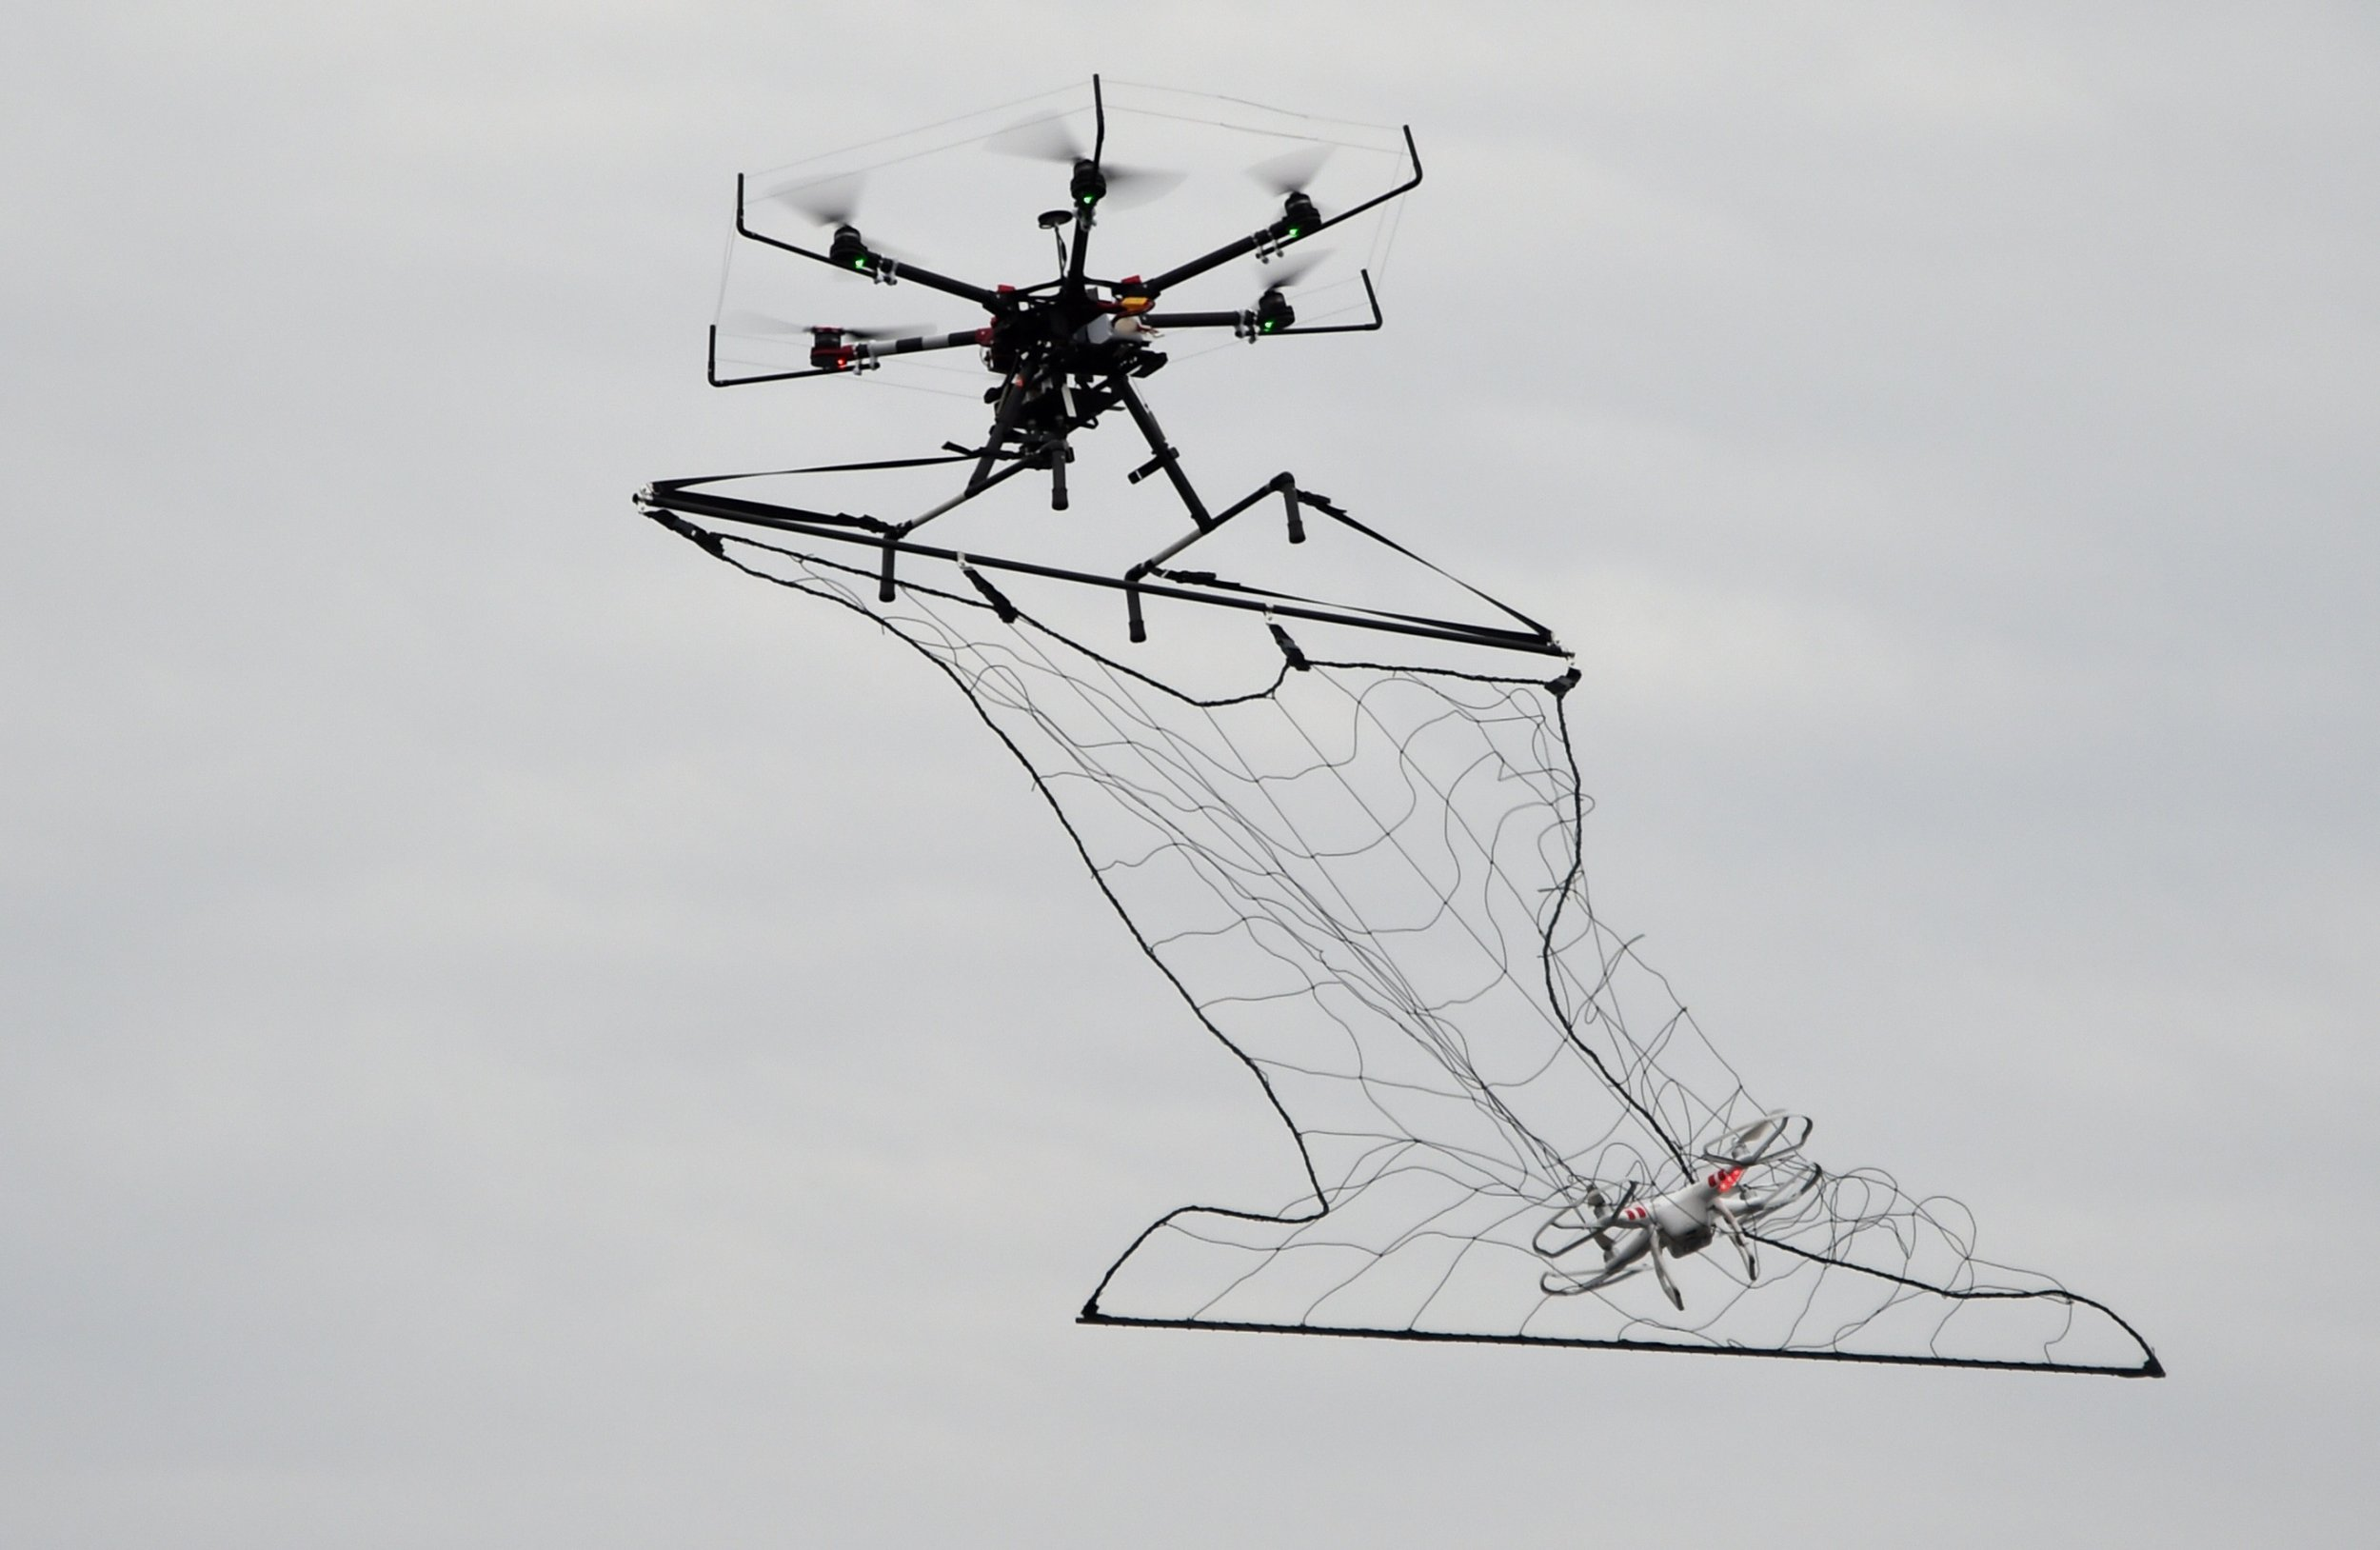 London Drone Ban During Barack Obama Visit to U.K. on